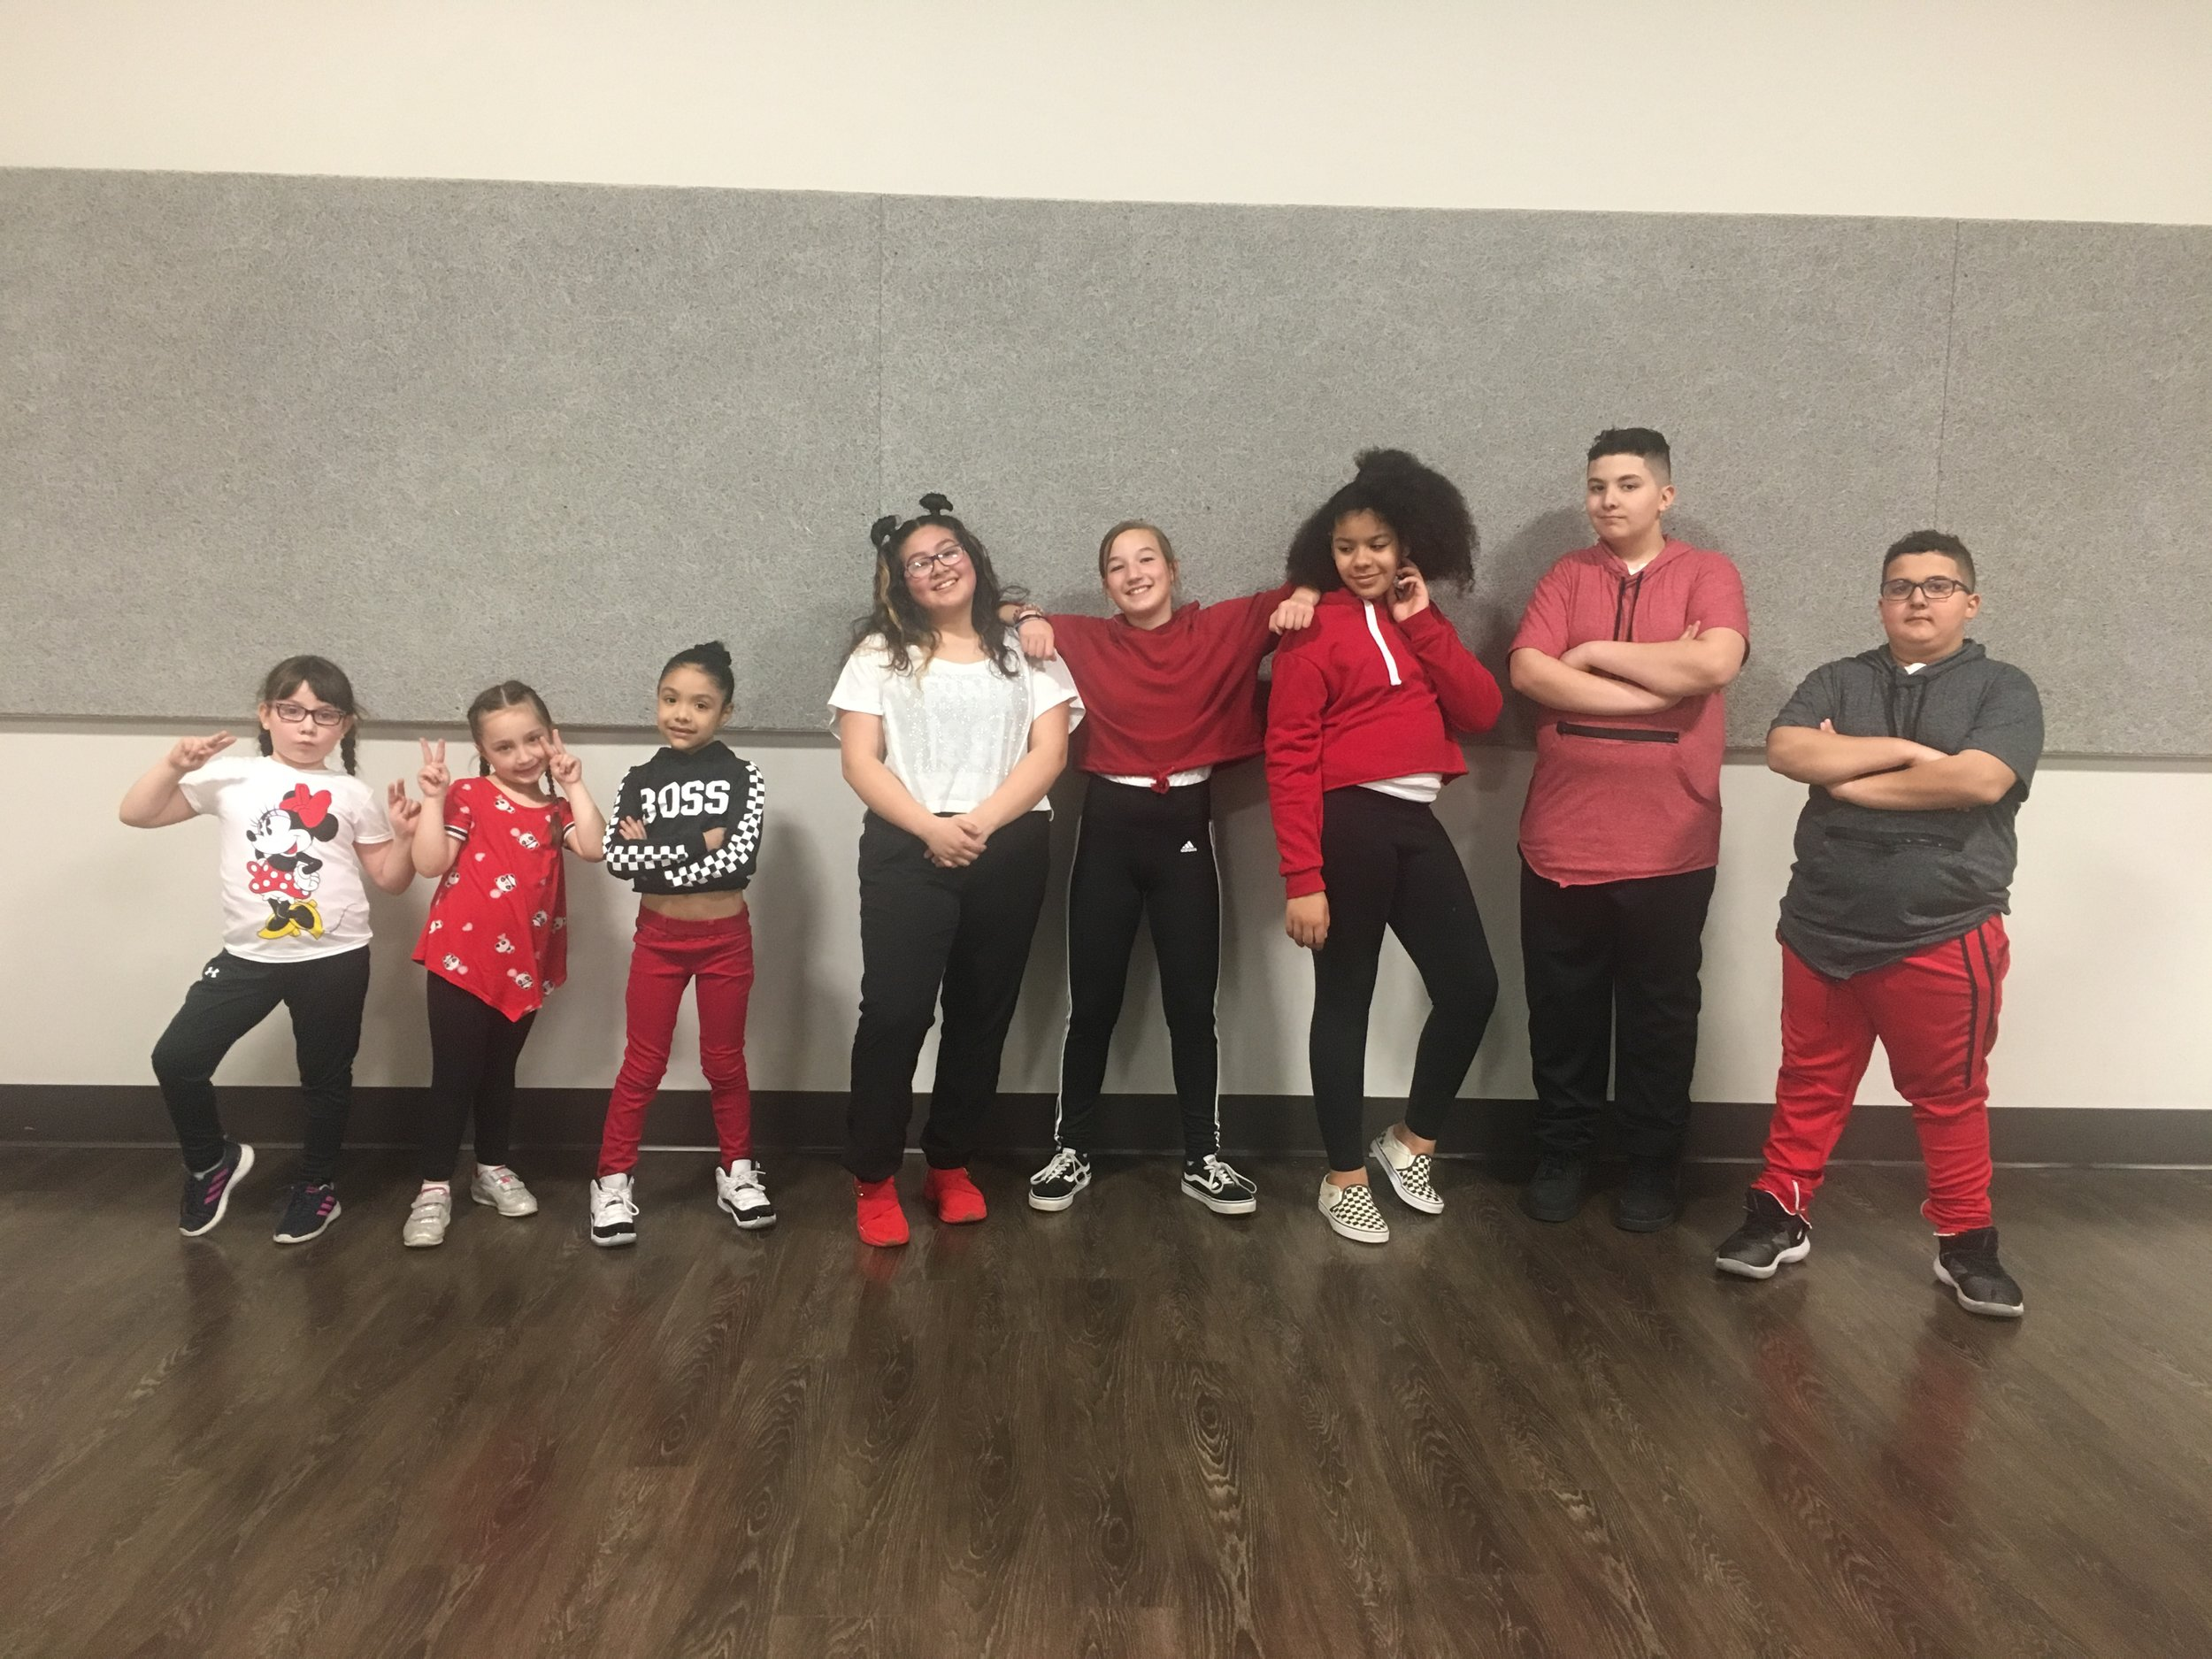 DanceRoom Chicago - Youth